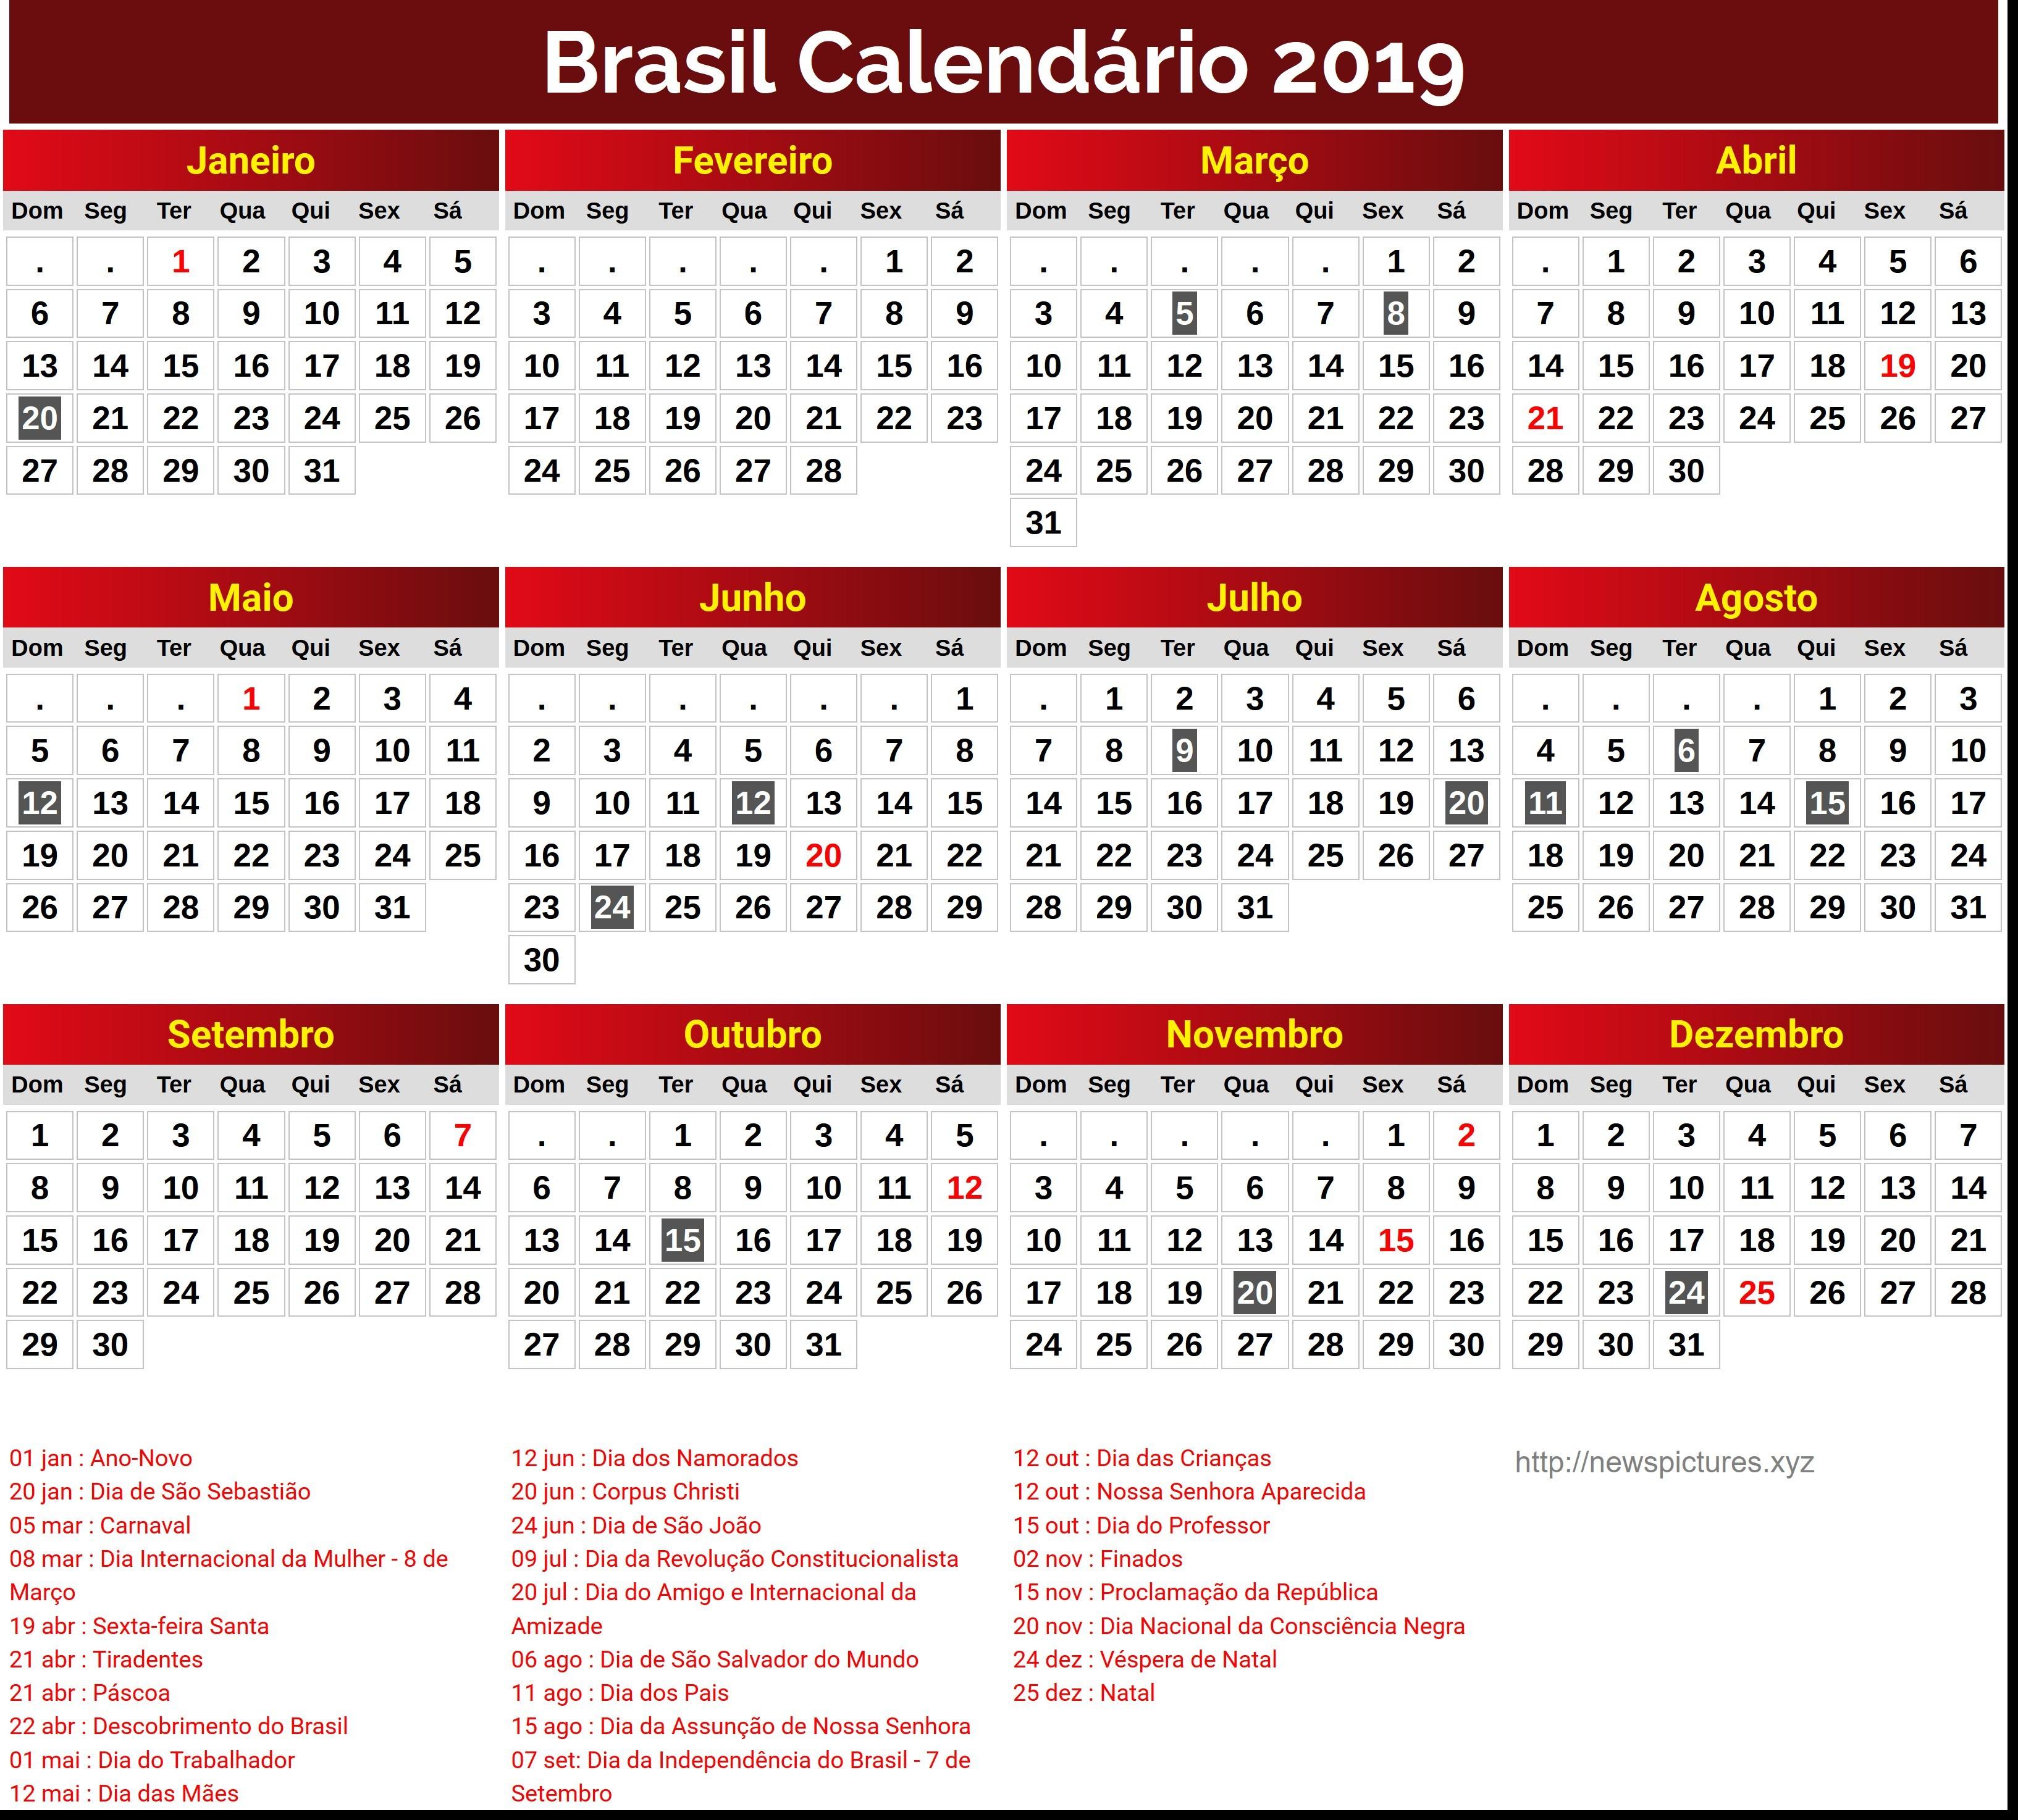 Calendario 2019 Mexico Semana Santa Más Arriba-a-fecha Evaluar Calendario 2019 Con Sus Feriados